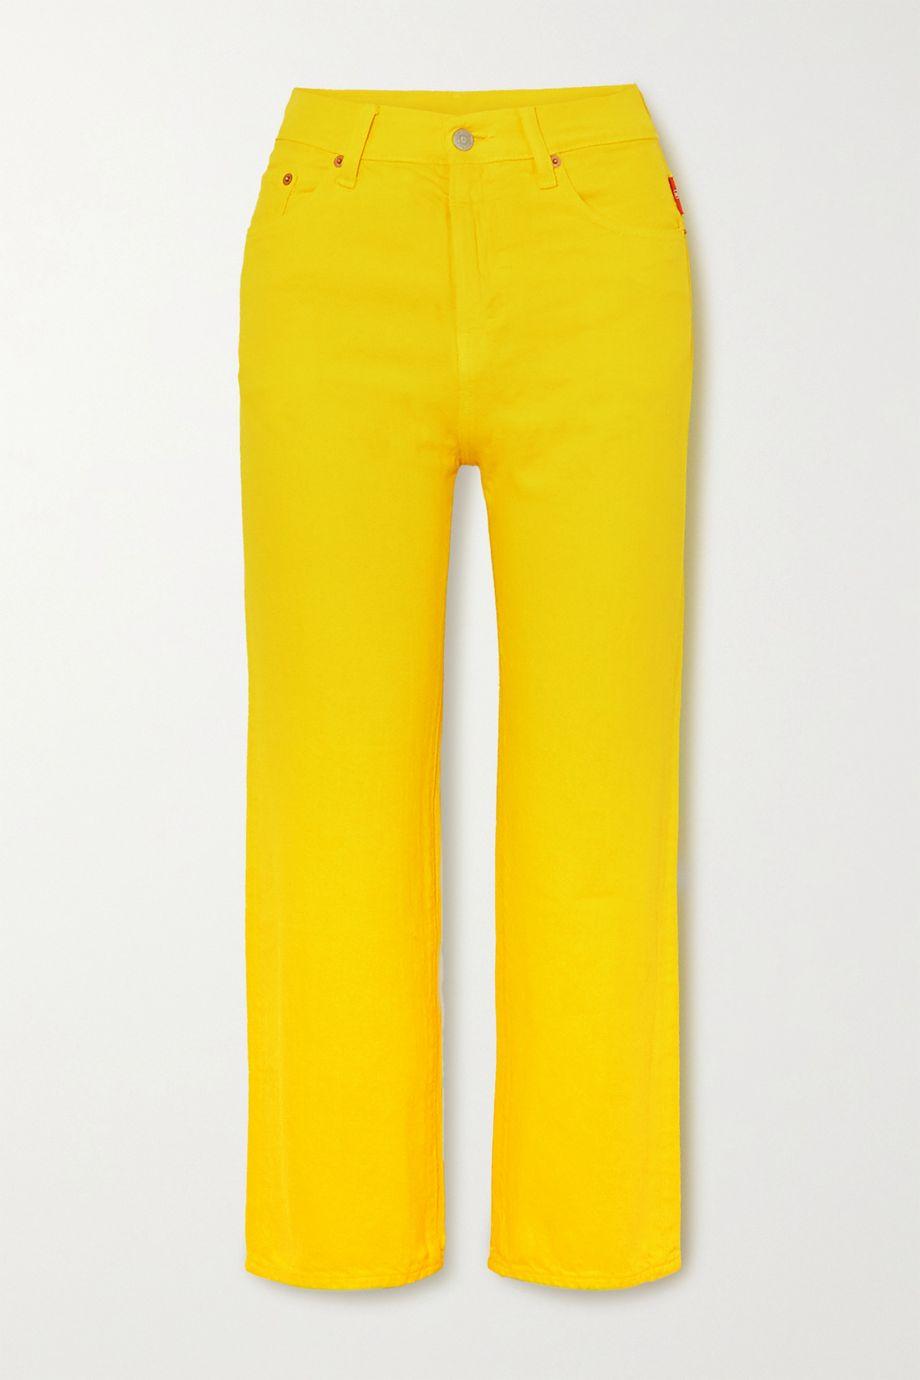 Denimist Pierce cropped high-rise straight-leg jeans